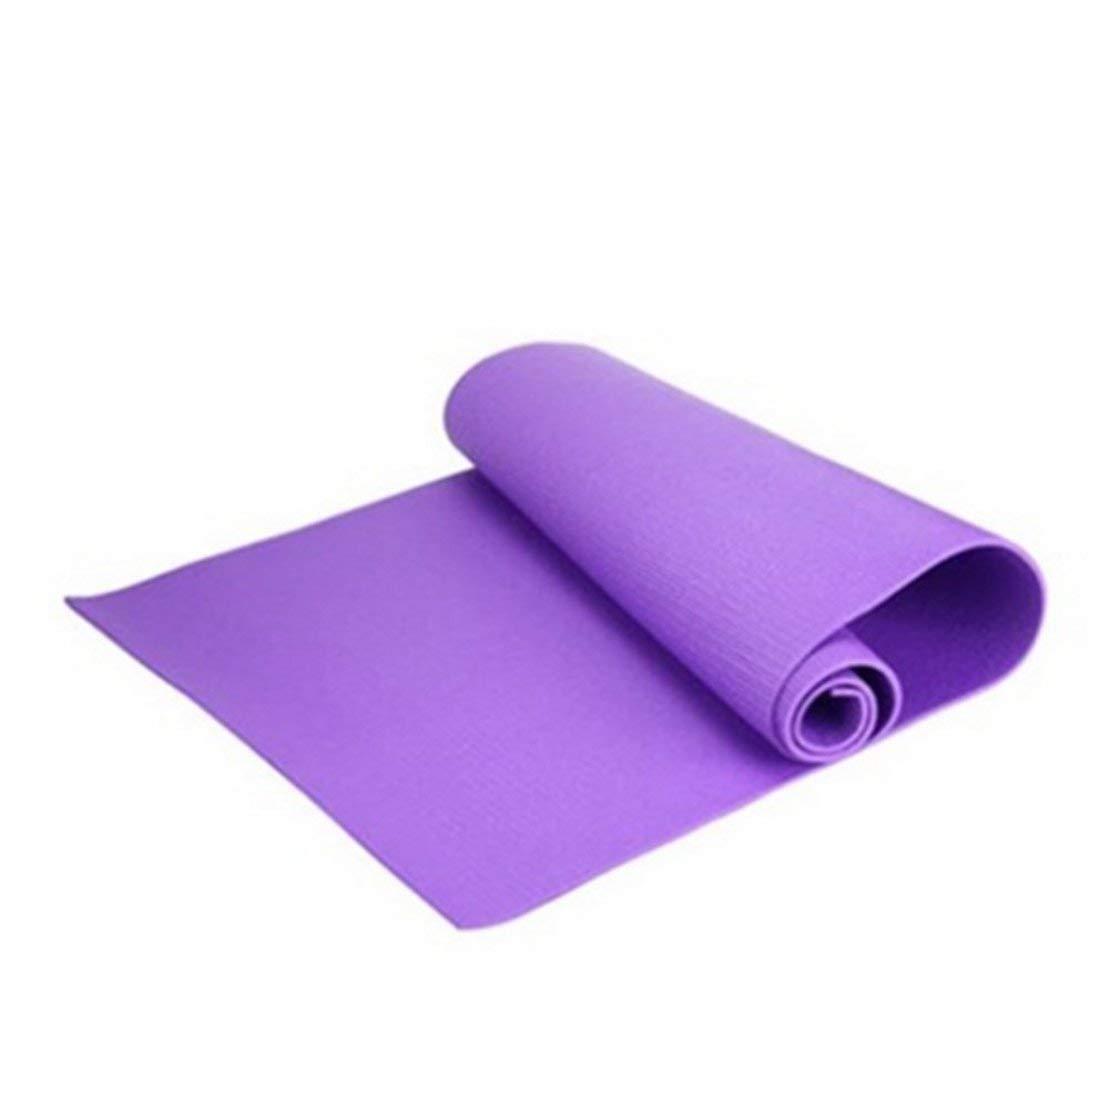 Laurelmartina 6mm Universal Thick Non-Slip Yoga Mat Exercise Pad Fitness Lose Weight 180cmX60cmX0.6cm Non-Skid Floor Play Mat